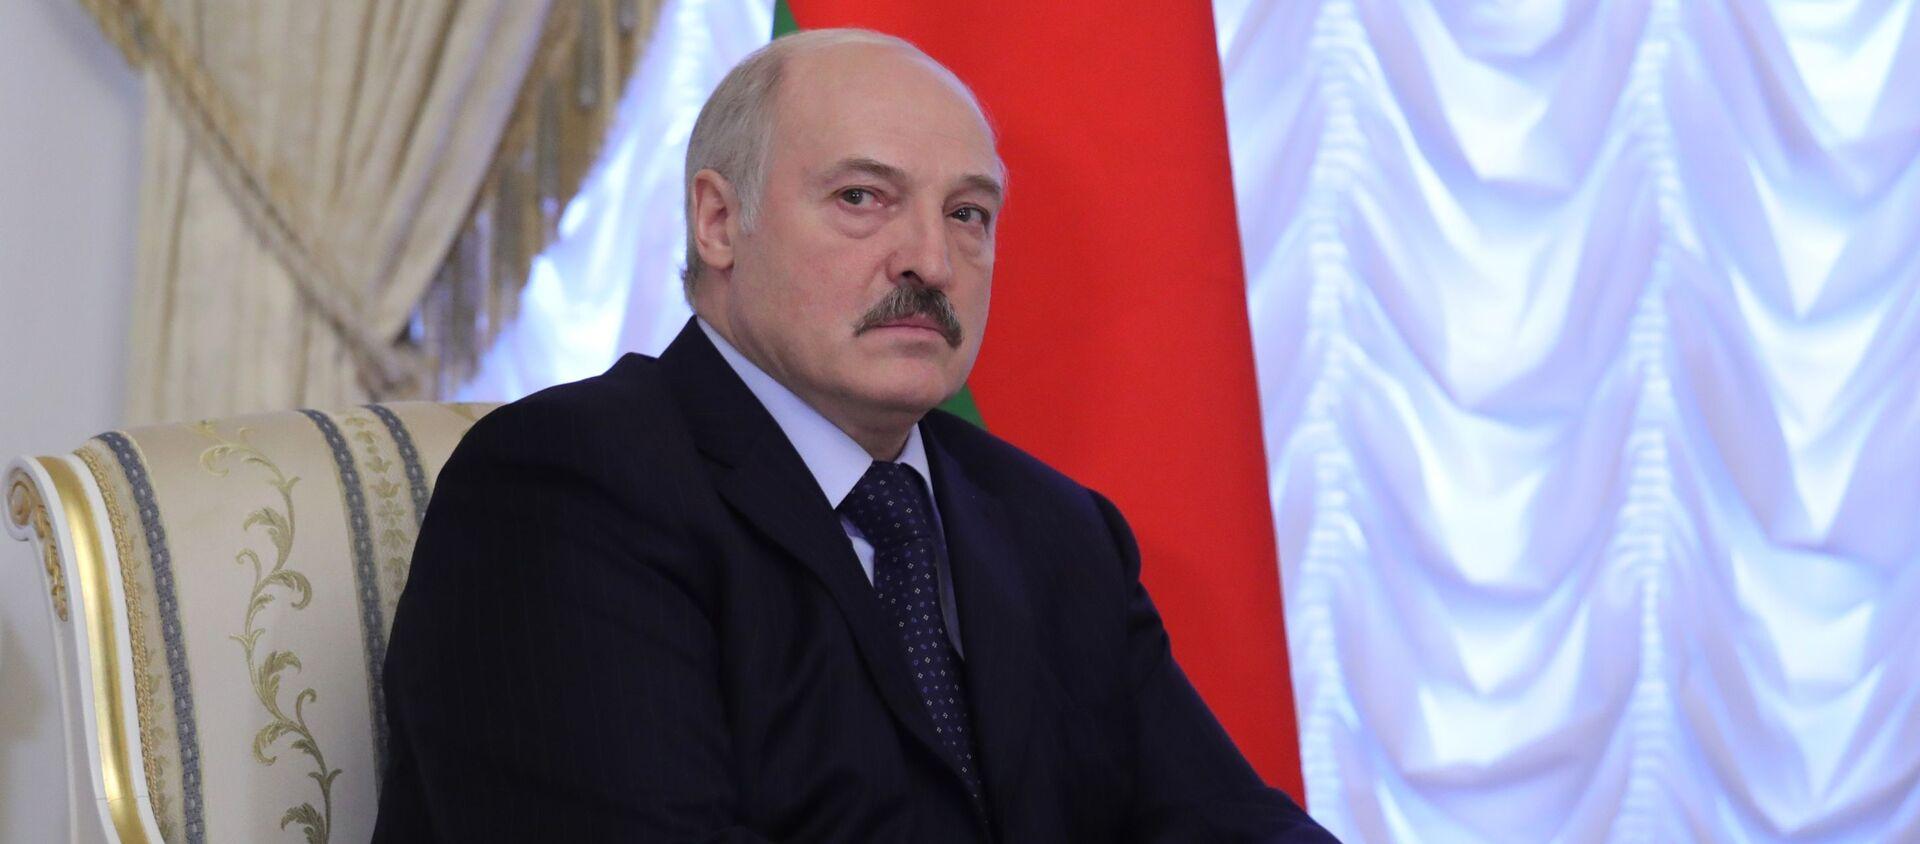 Tổng thống Belarus Alexandr Lukashenko  - Sputnik Việt Nam, 1920, 09.08.2021